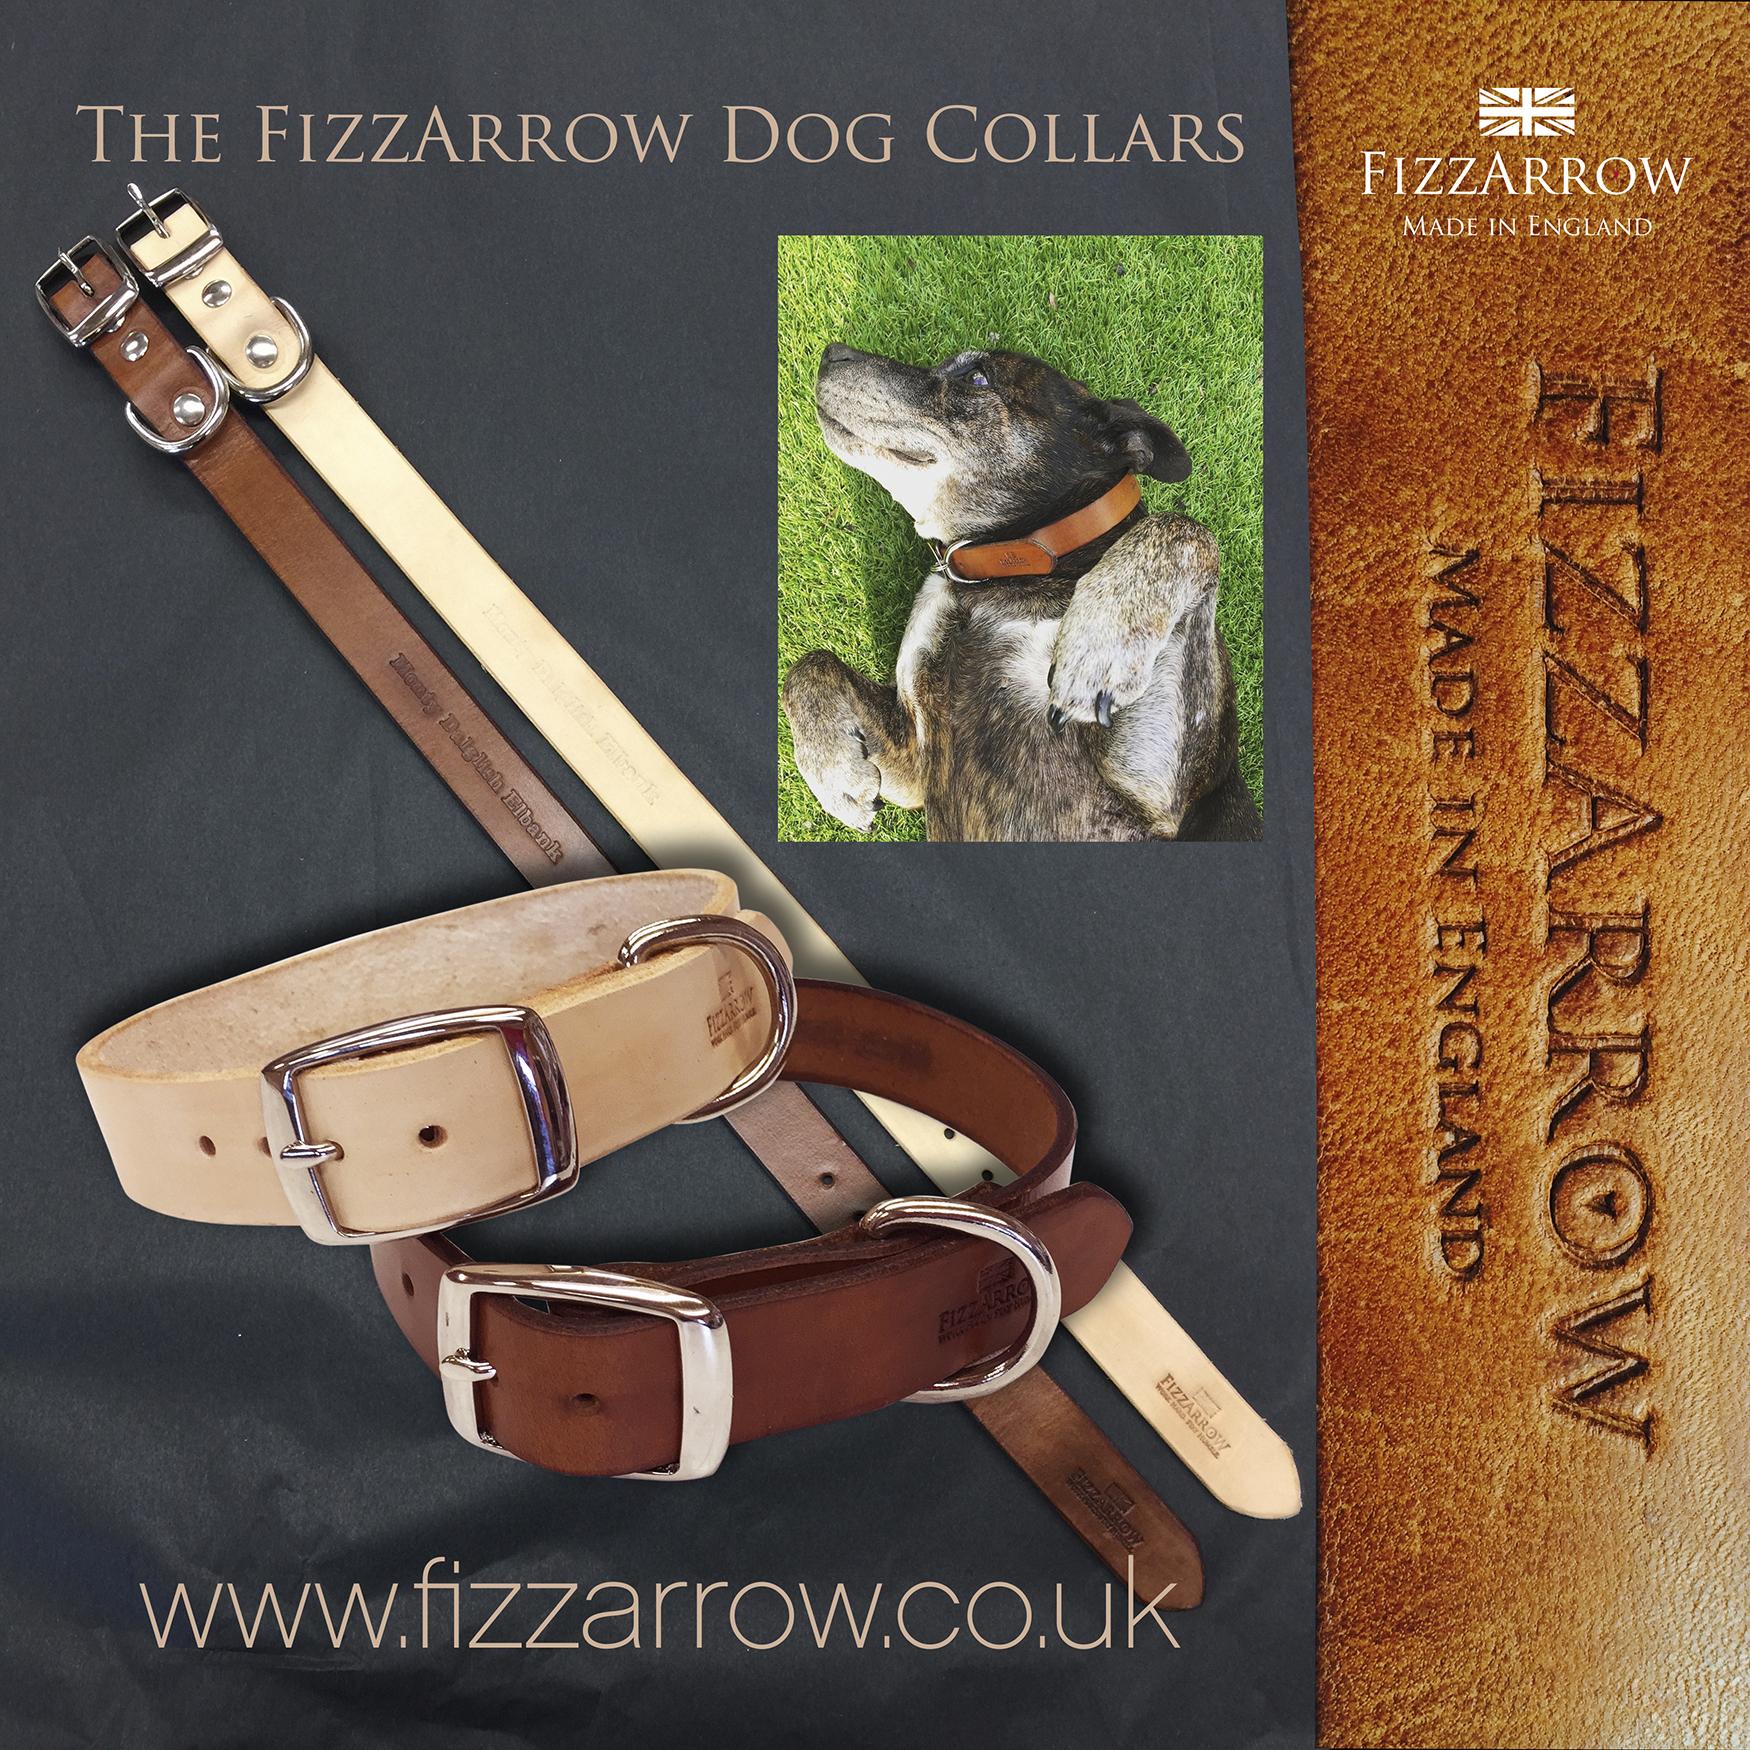 FizzArrow Dog Collars sm.jpg